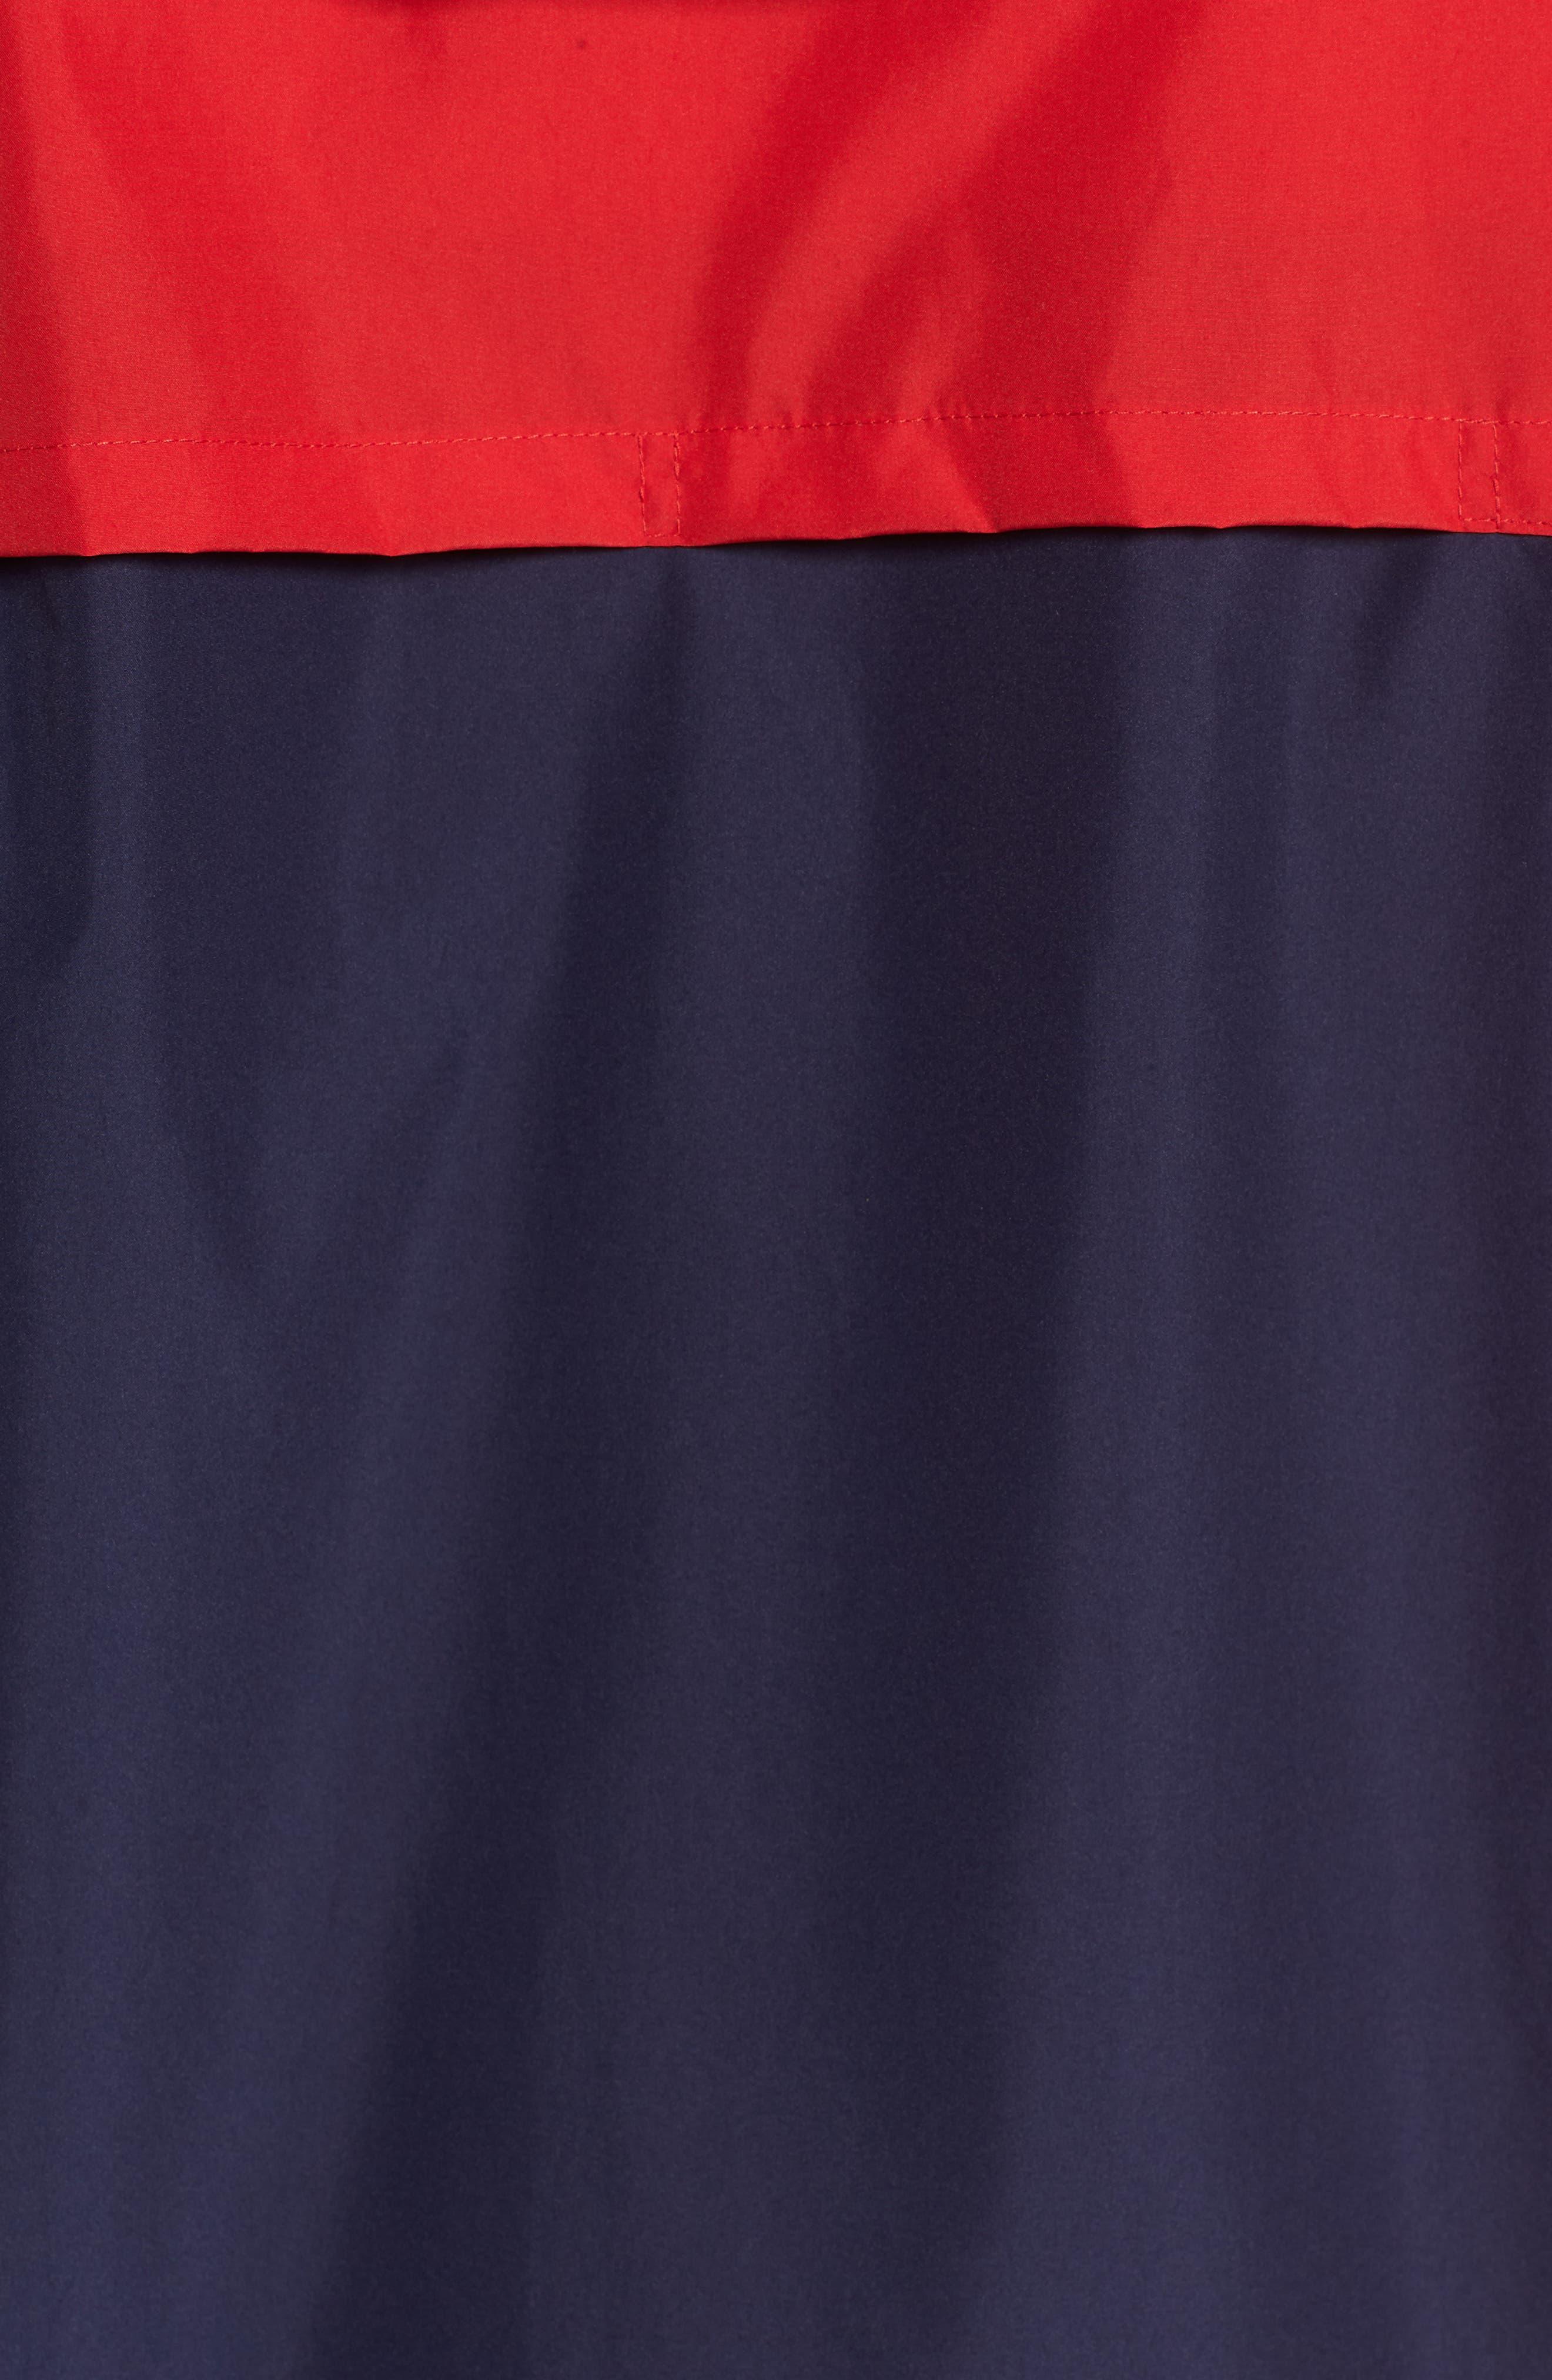 Athletics 78 Jacket,                             Alternate thumbnail 5, color,                             Team Red